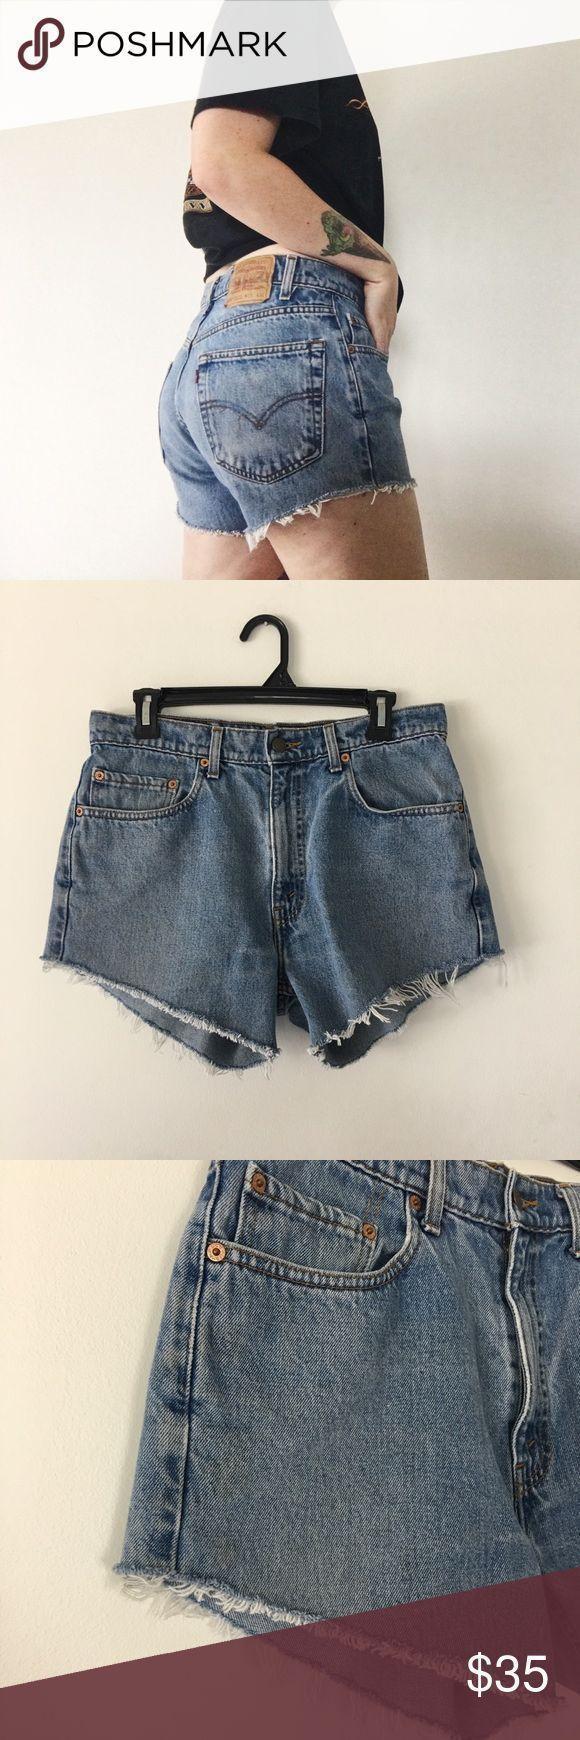 Vintage High Rise Levi's 505 Denim Cutoff Shorts High waisted 505 style  These...  - My Posh Picks - #Cutoff #Denim #High #Levis #Picks #Posh #Rise #Shorts #Style #Vintage #Waisted #denimcutoffshorts Vintage High Rise Levi's 505 Denim Cutoff Shorts High waisted 505 style  These...  - My Posh Picks - #Cutoff #Denim #High #Levis #Picks #Posh #Rise #Shorts #Style #Vintage #Waisted #denimcutoffshorts Vintage High Rise Levi's 505 Denim Cutoff Shorts High waisted 505 style  These...  - My Posh P #denimcutoffshorts